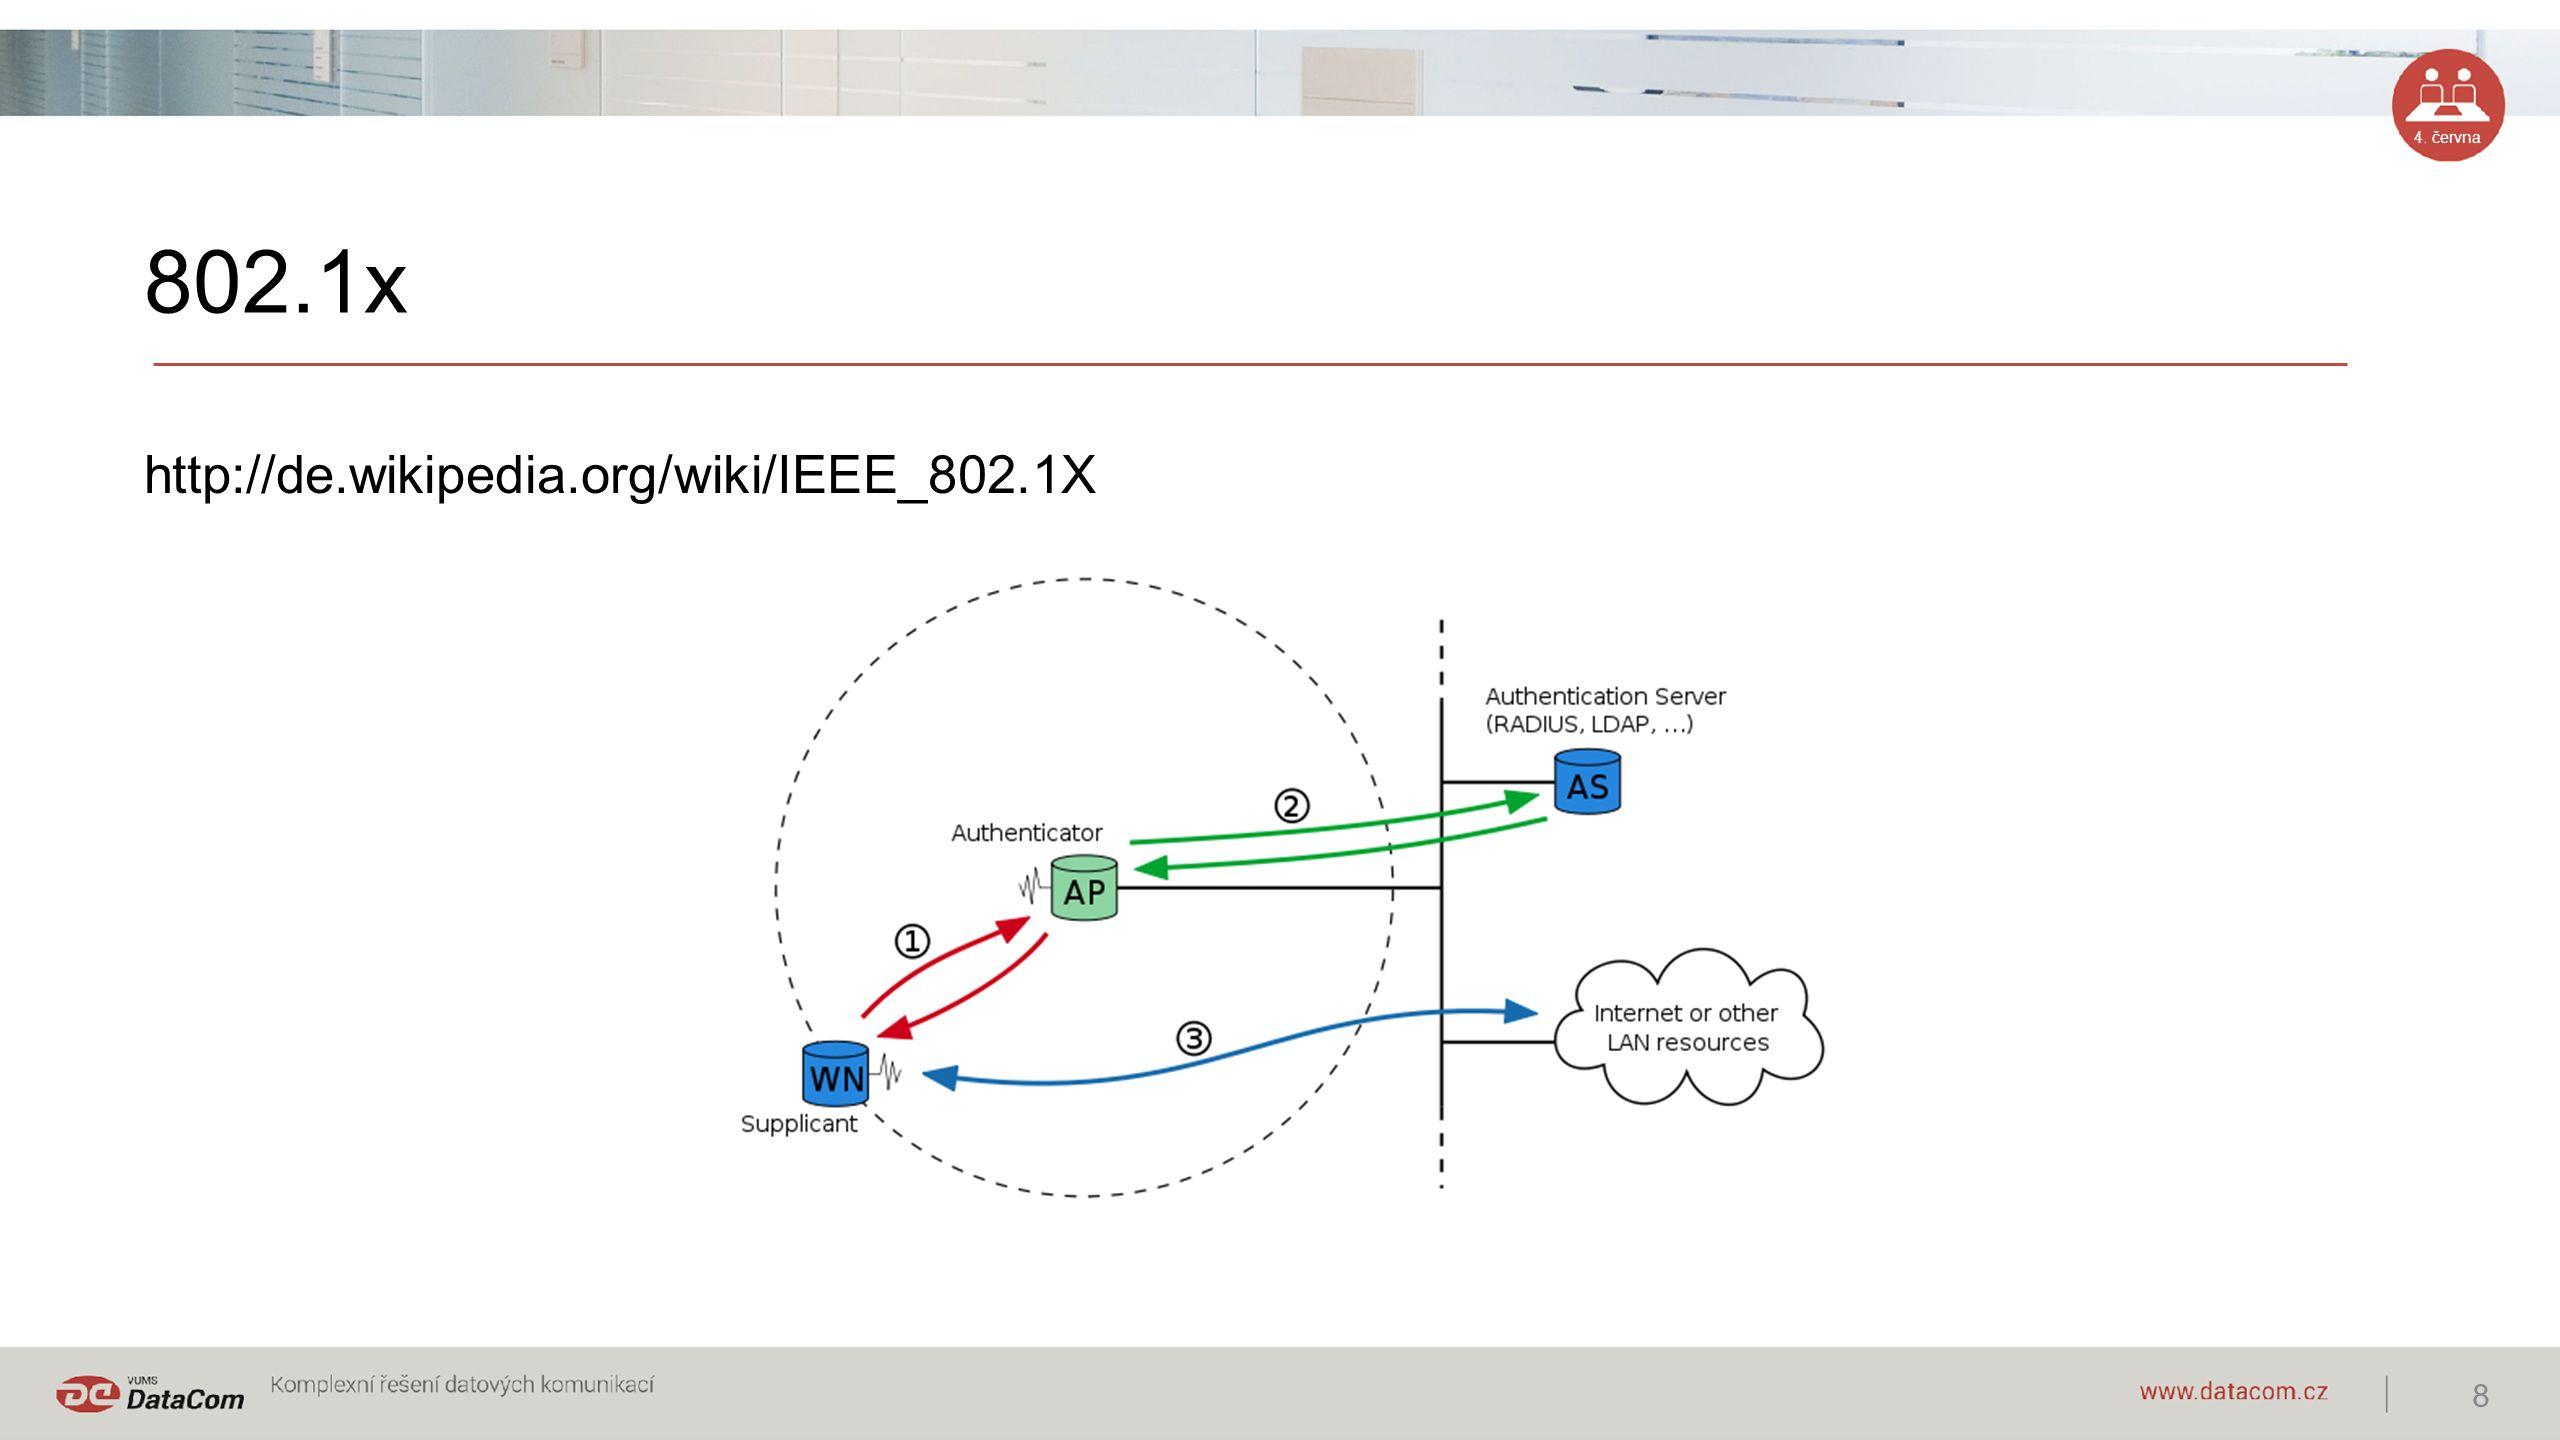 4. června 802.1x http://de.wikipedia.org/wiki/IEEE_802.1X 8